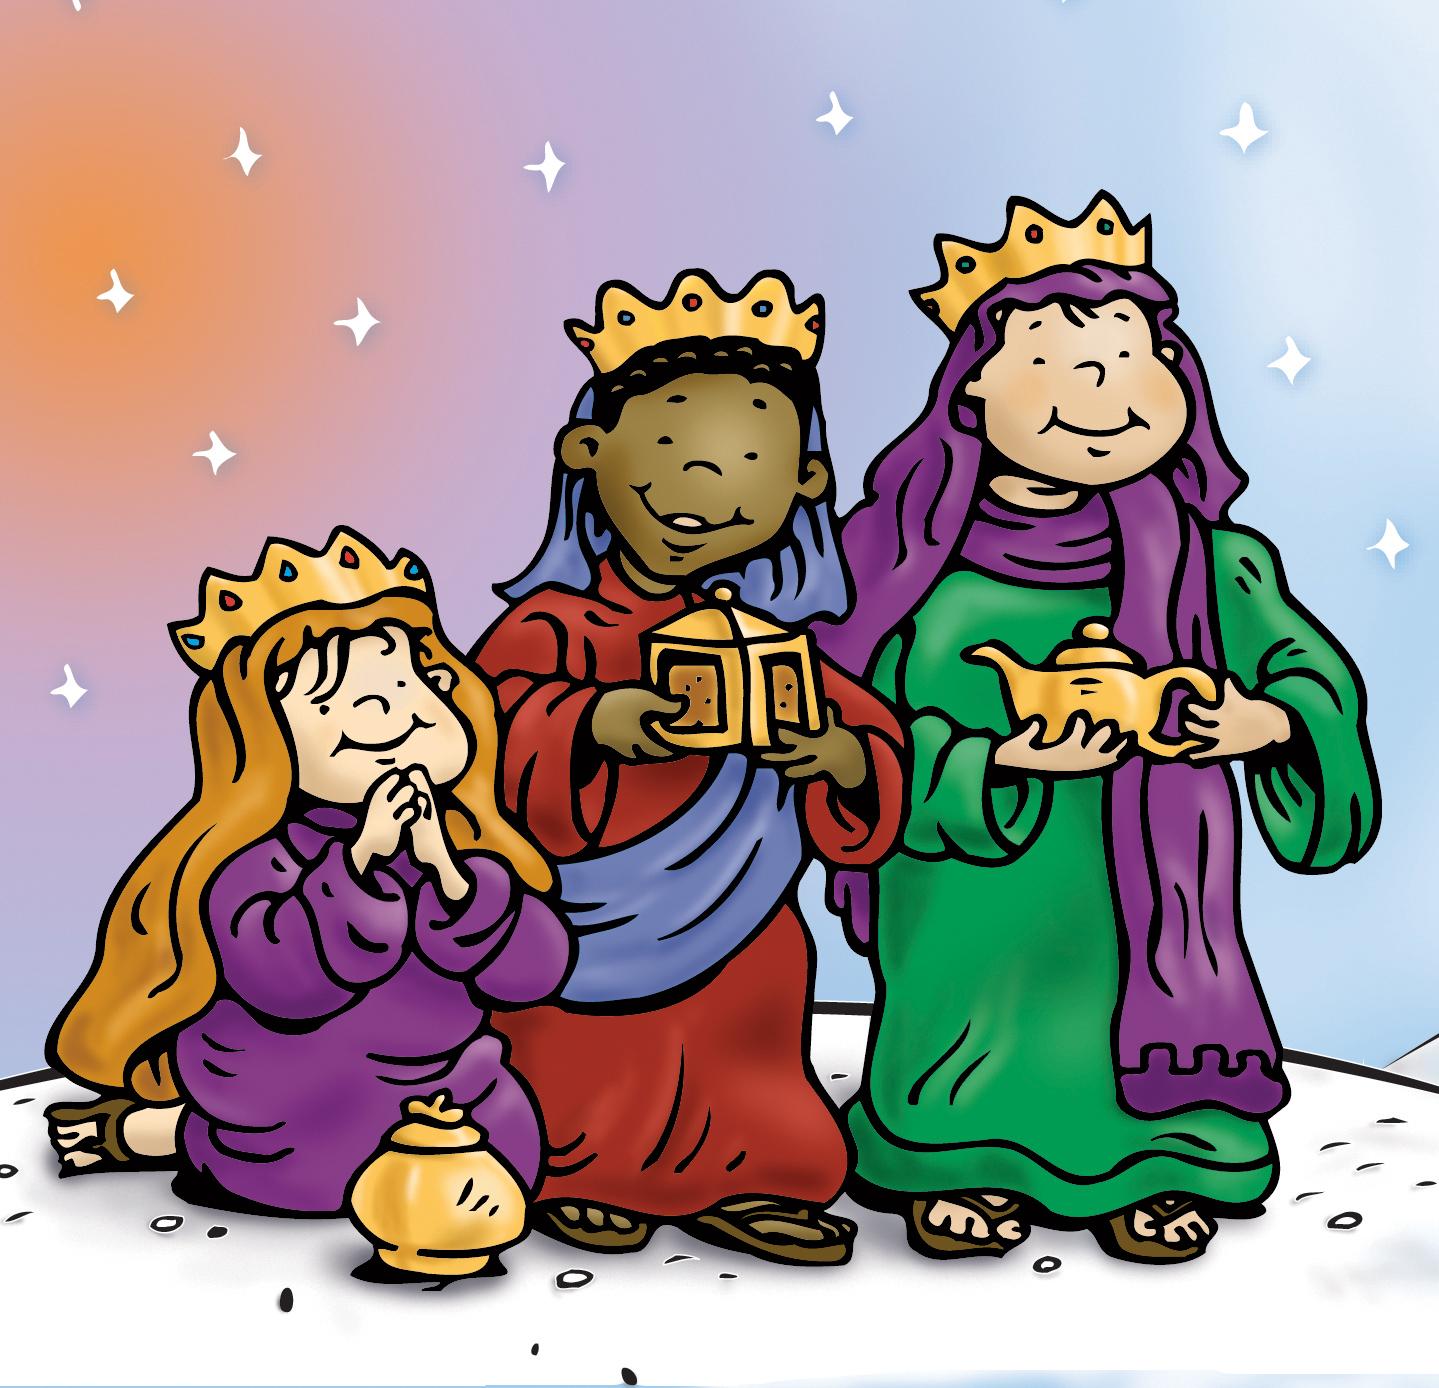 sunday school christmas program clipart 10 free Cliparts ... (1439 x 1388 Pixel)